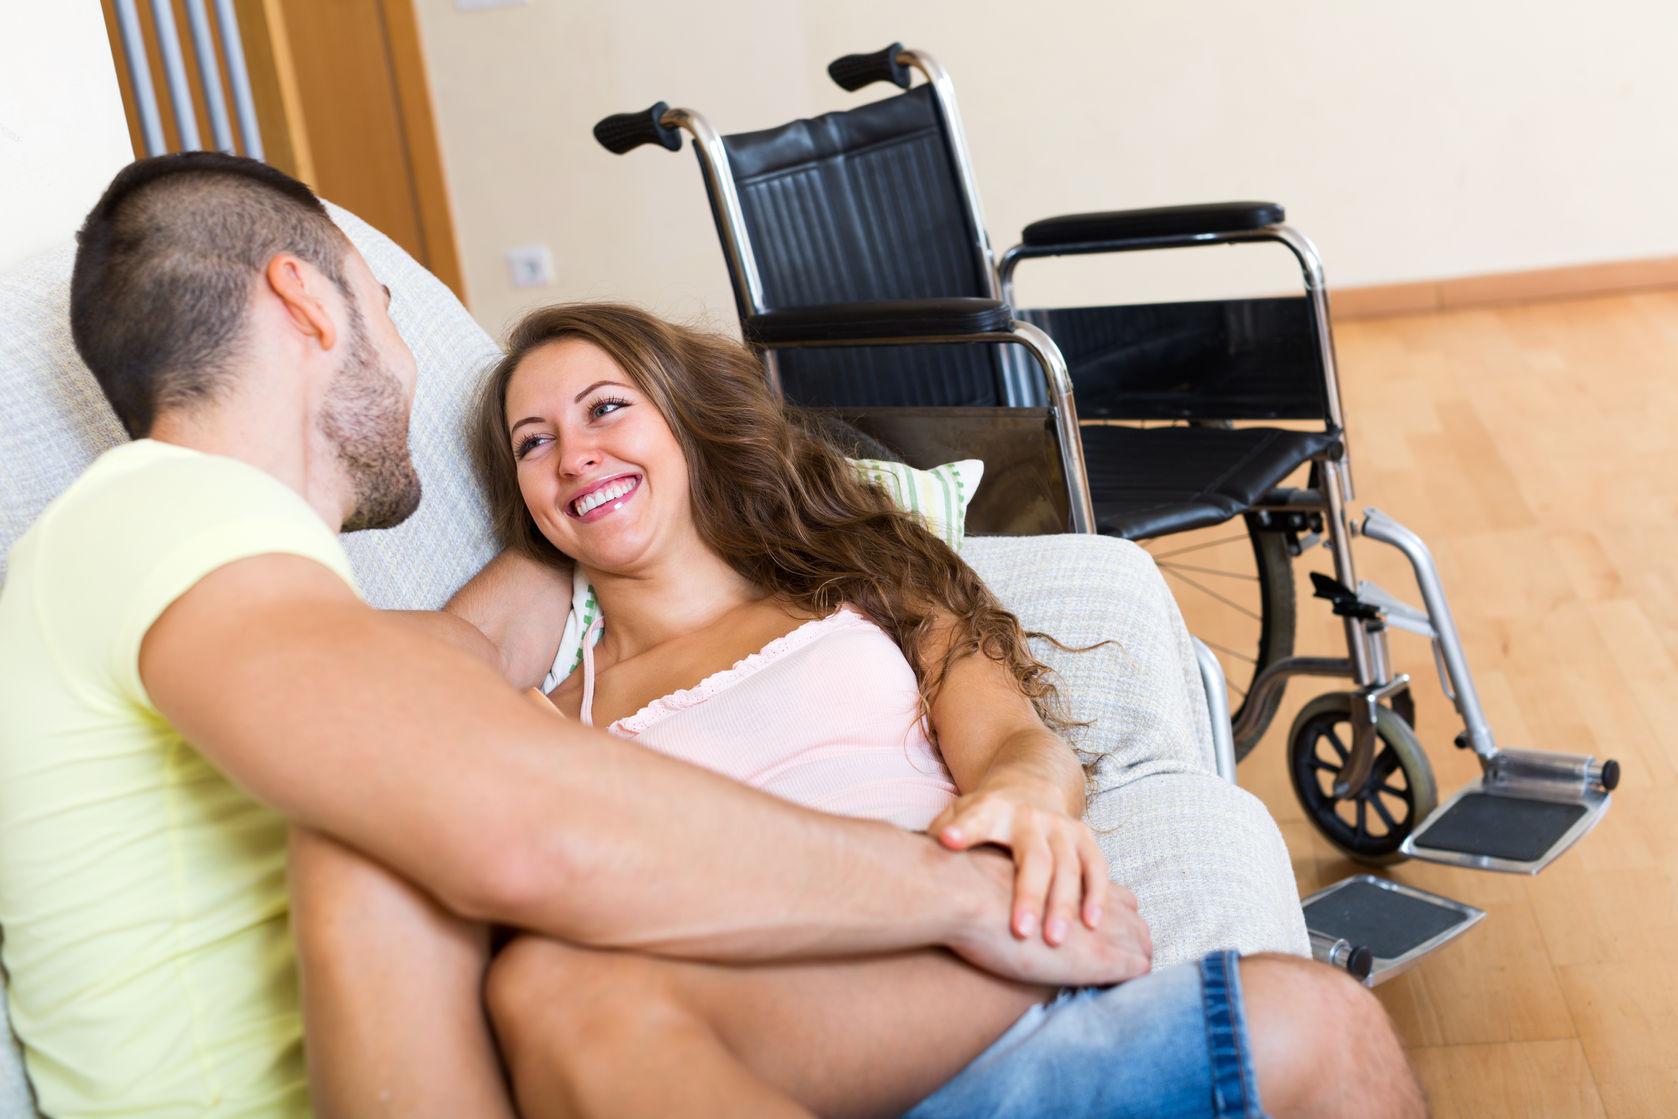 Disabili e sessualità